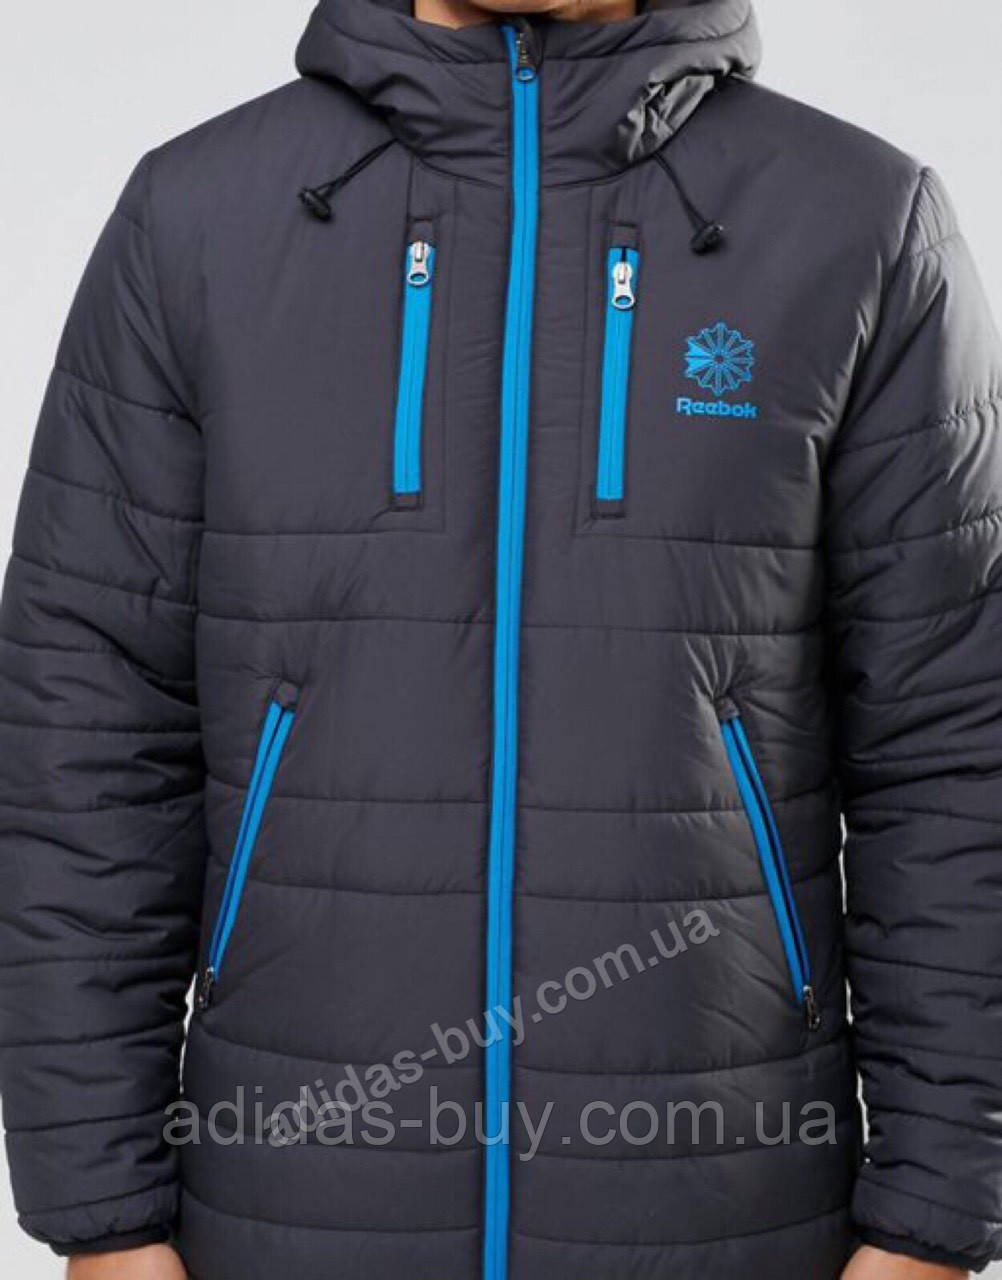 Куртка мужская оригинальная зимняя Reebok PADDED MID 2 JACKET AY1253 ц eba02efaadb84